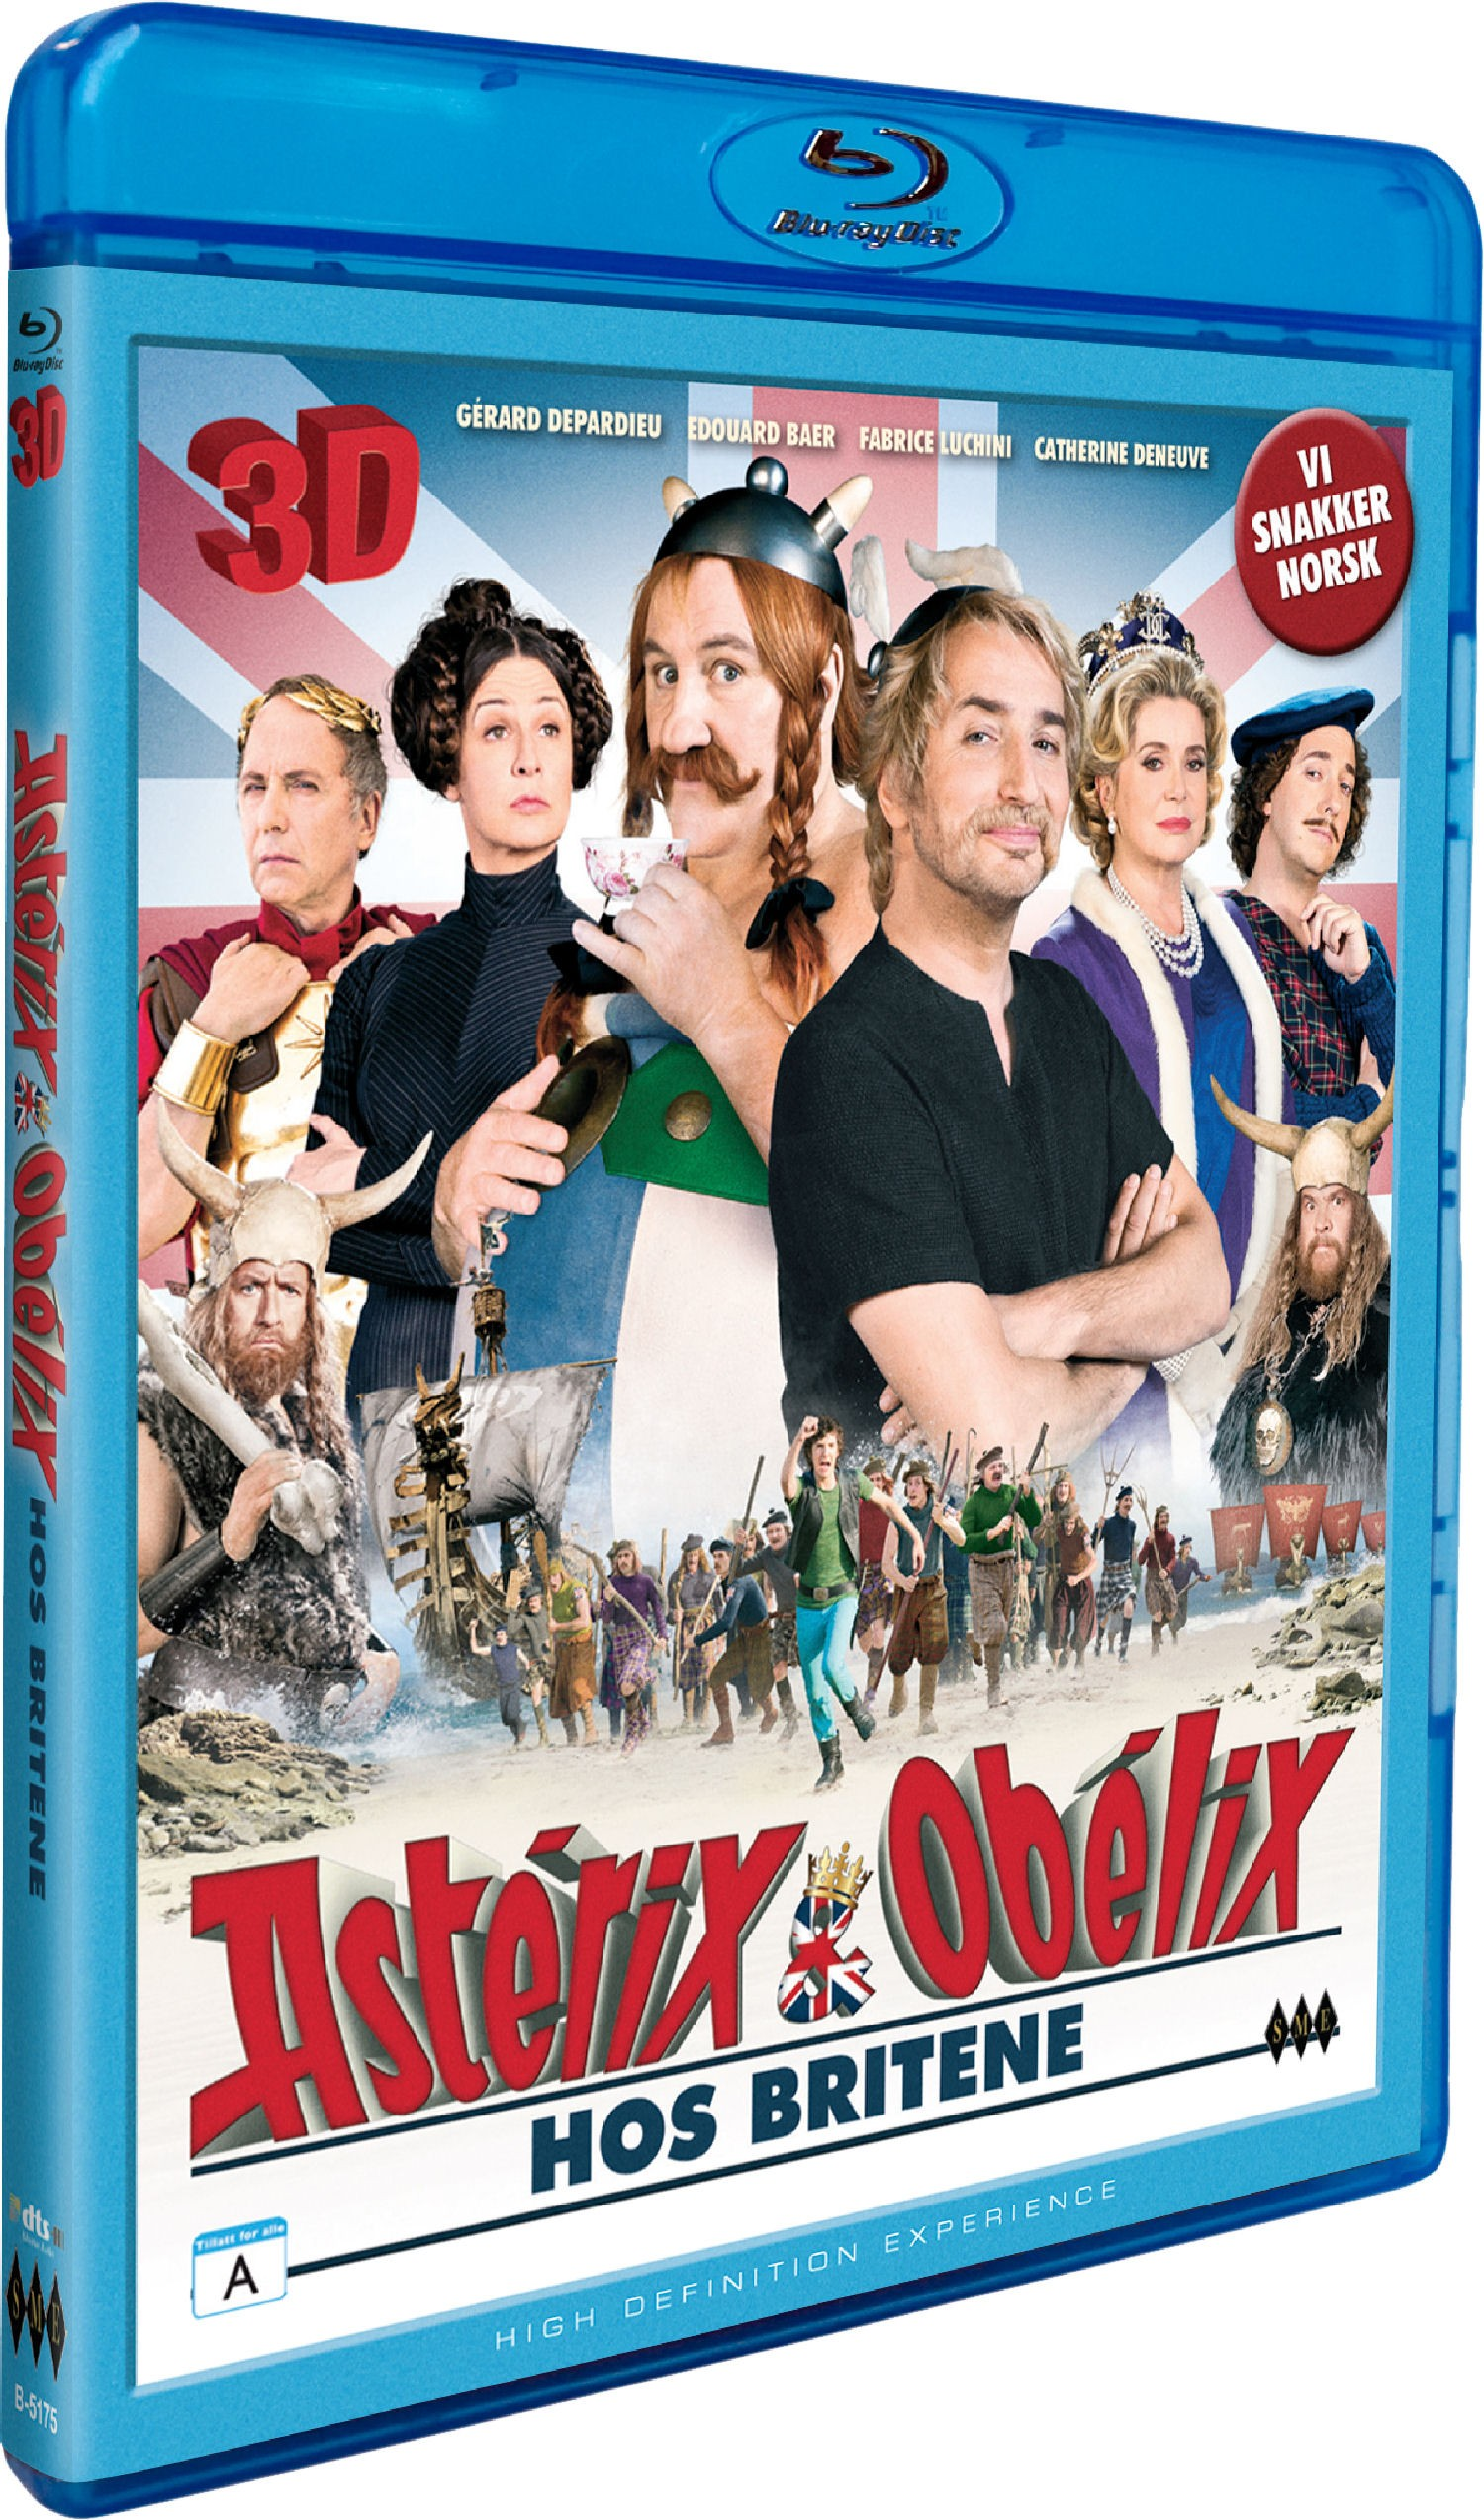 BD3DASTERIX : Asterix og Obelix hos Britene (3D Blu-ray)